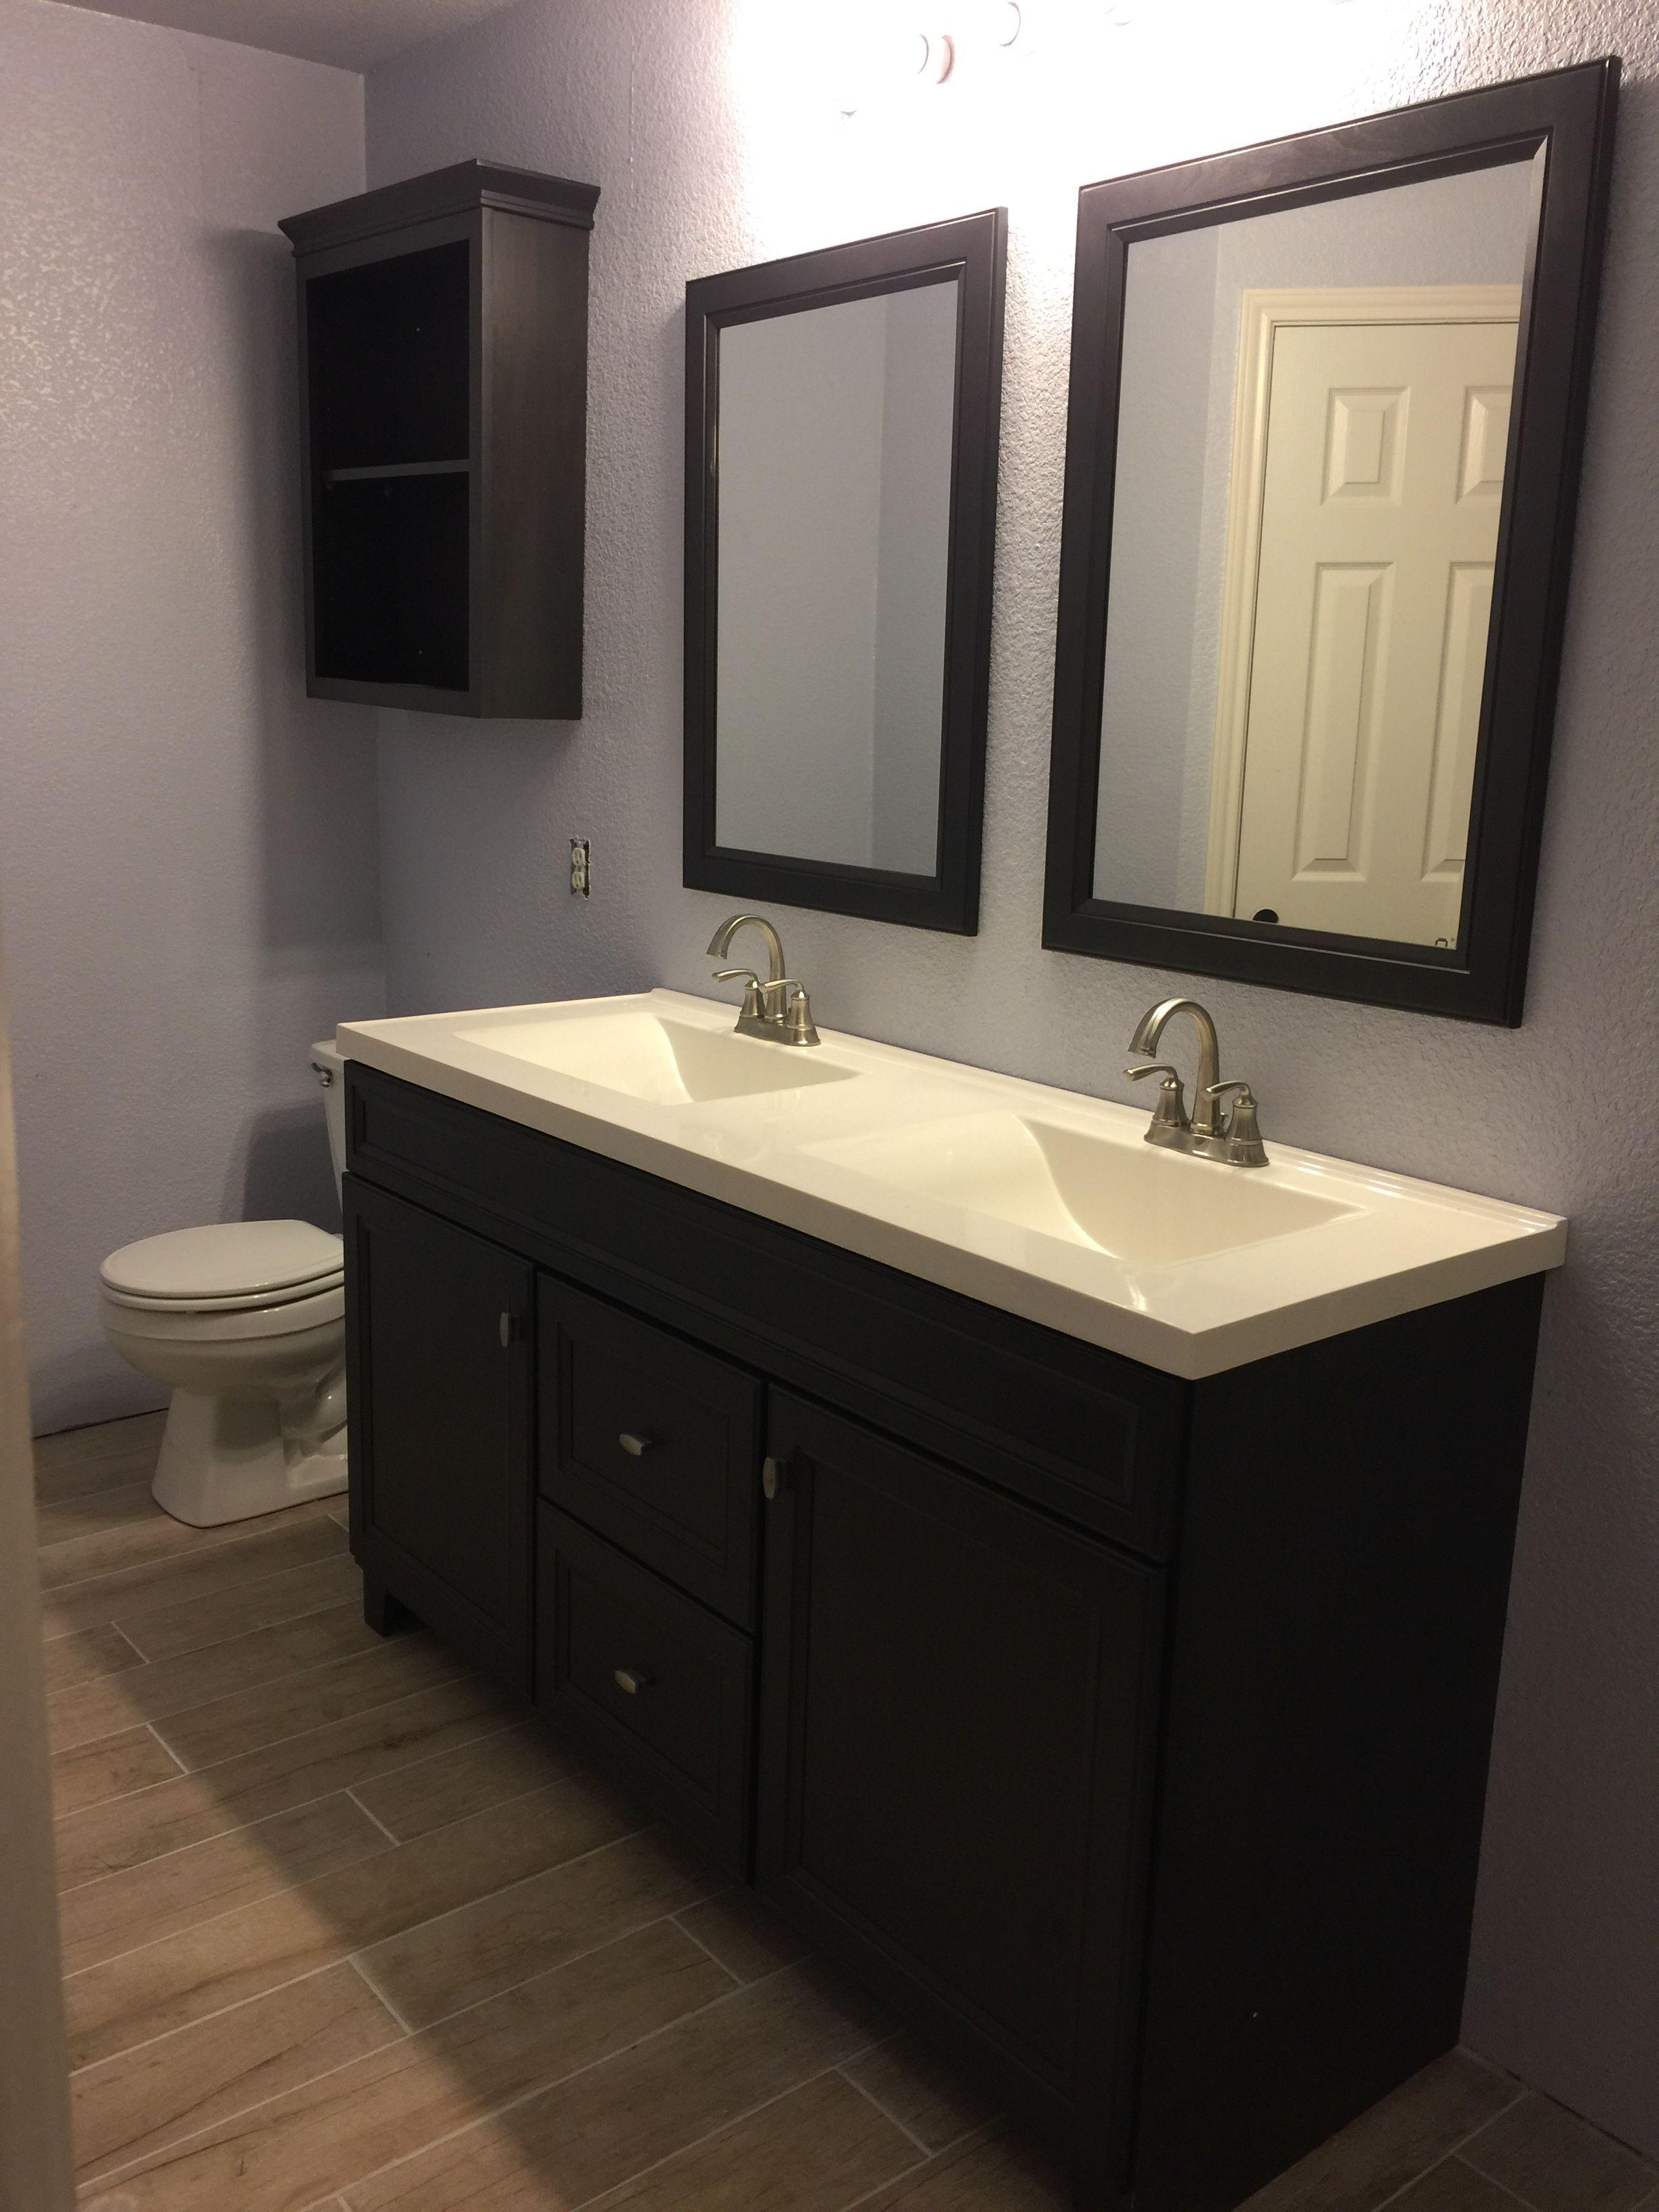 Peachy Master Bathroom Diamond Fresh Fit Goslin 60 Vanity Home Interior And Landscaping Elinuenasavecom